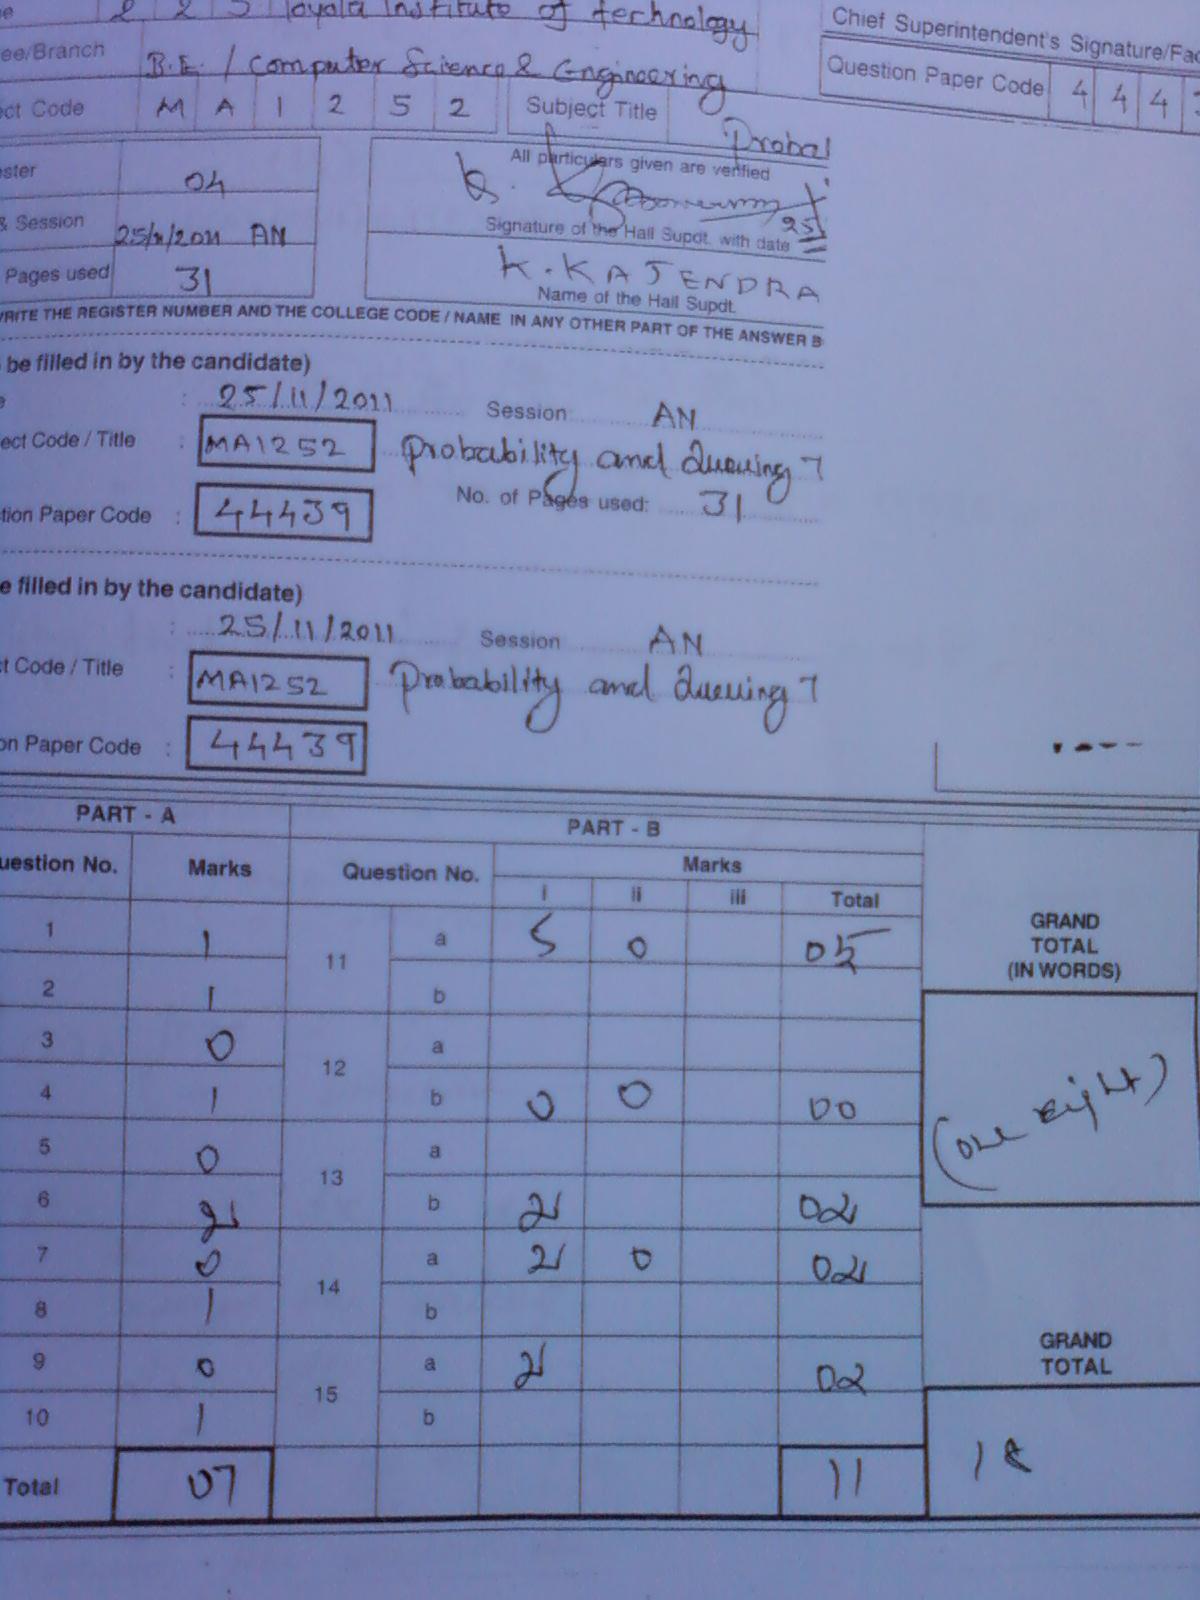 Anna university physics lab2 manual ebook array anna university answer sheet after correction pqt u0026 maths 3 rh iannauniversity fandeluxe Images